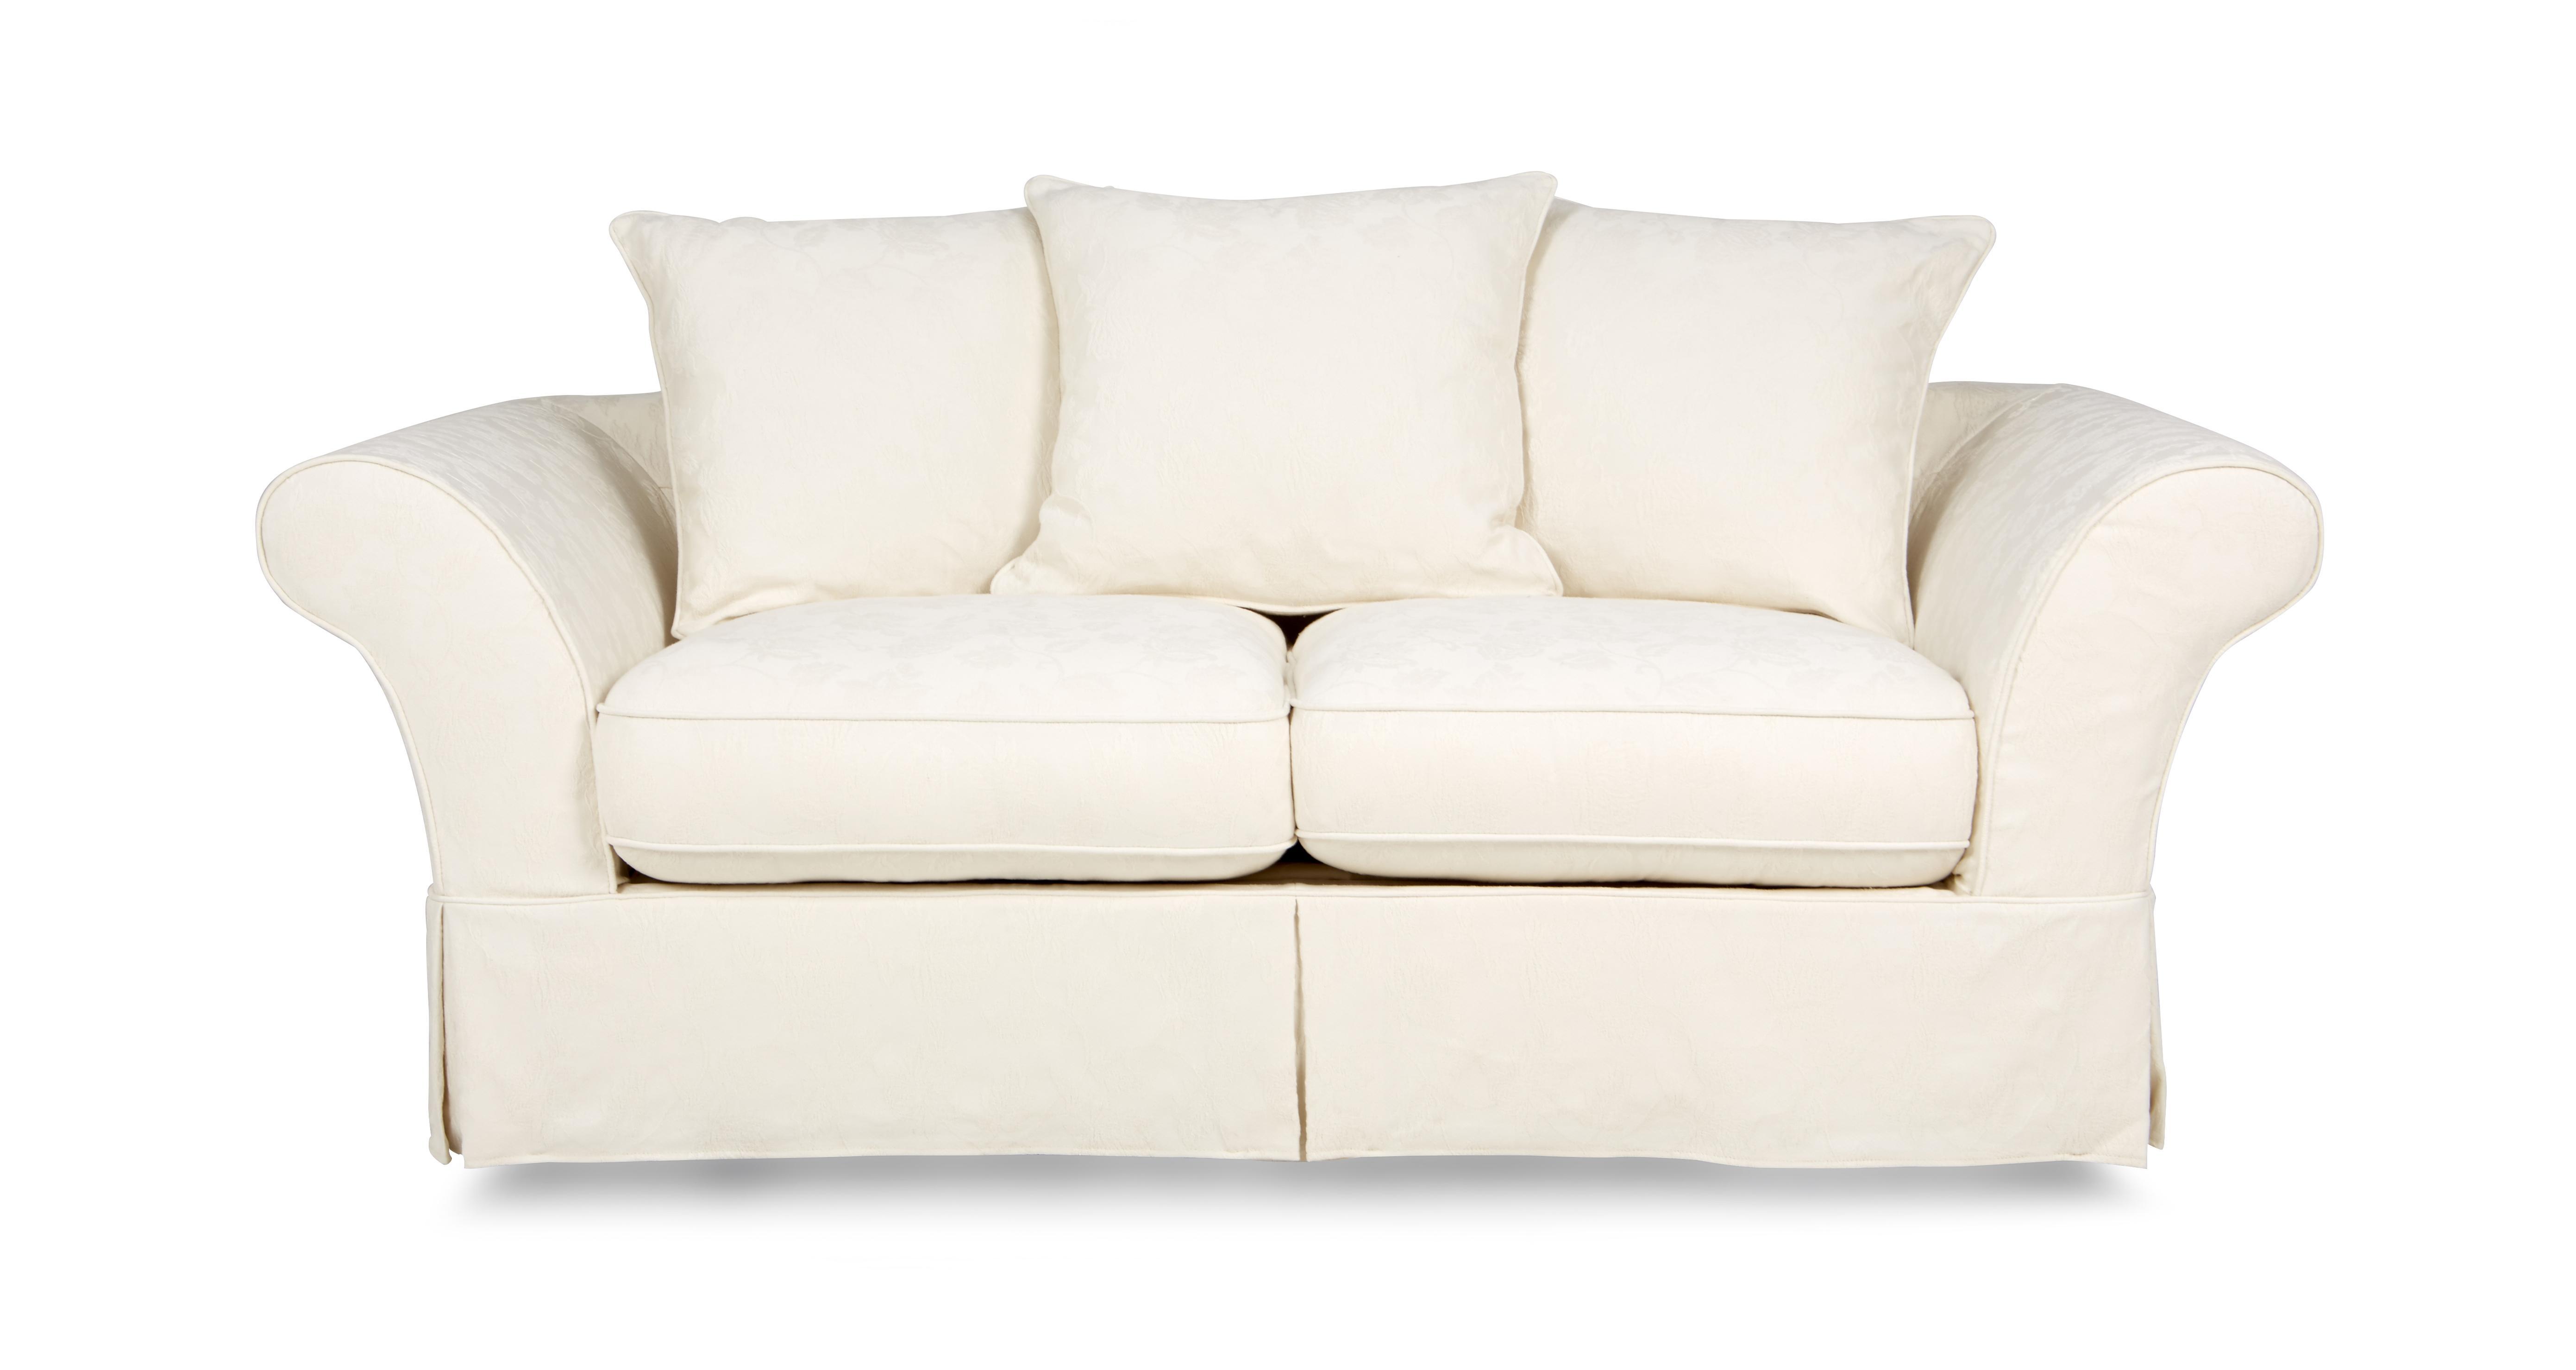 Rosa 2 Seater Pillow Back Sofa